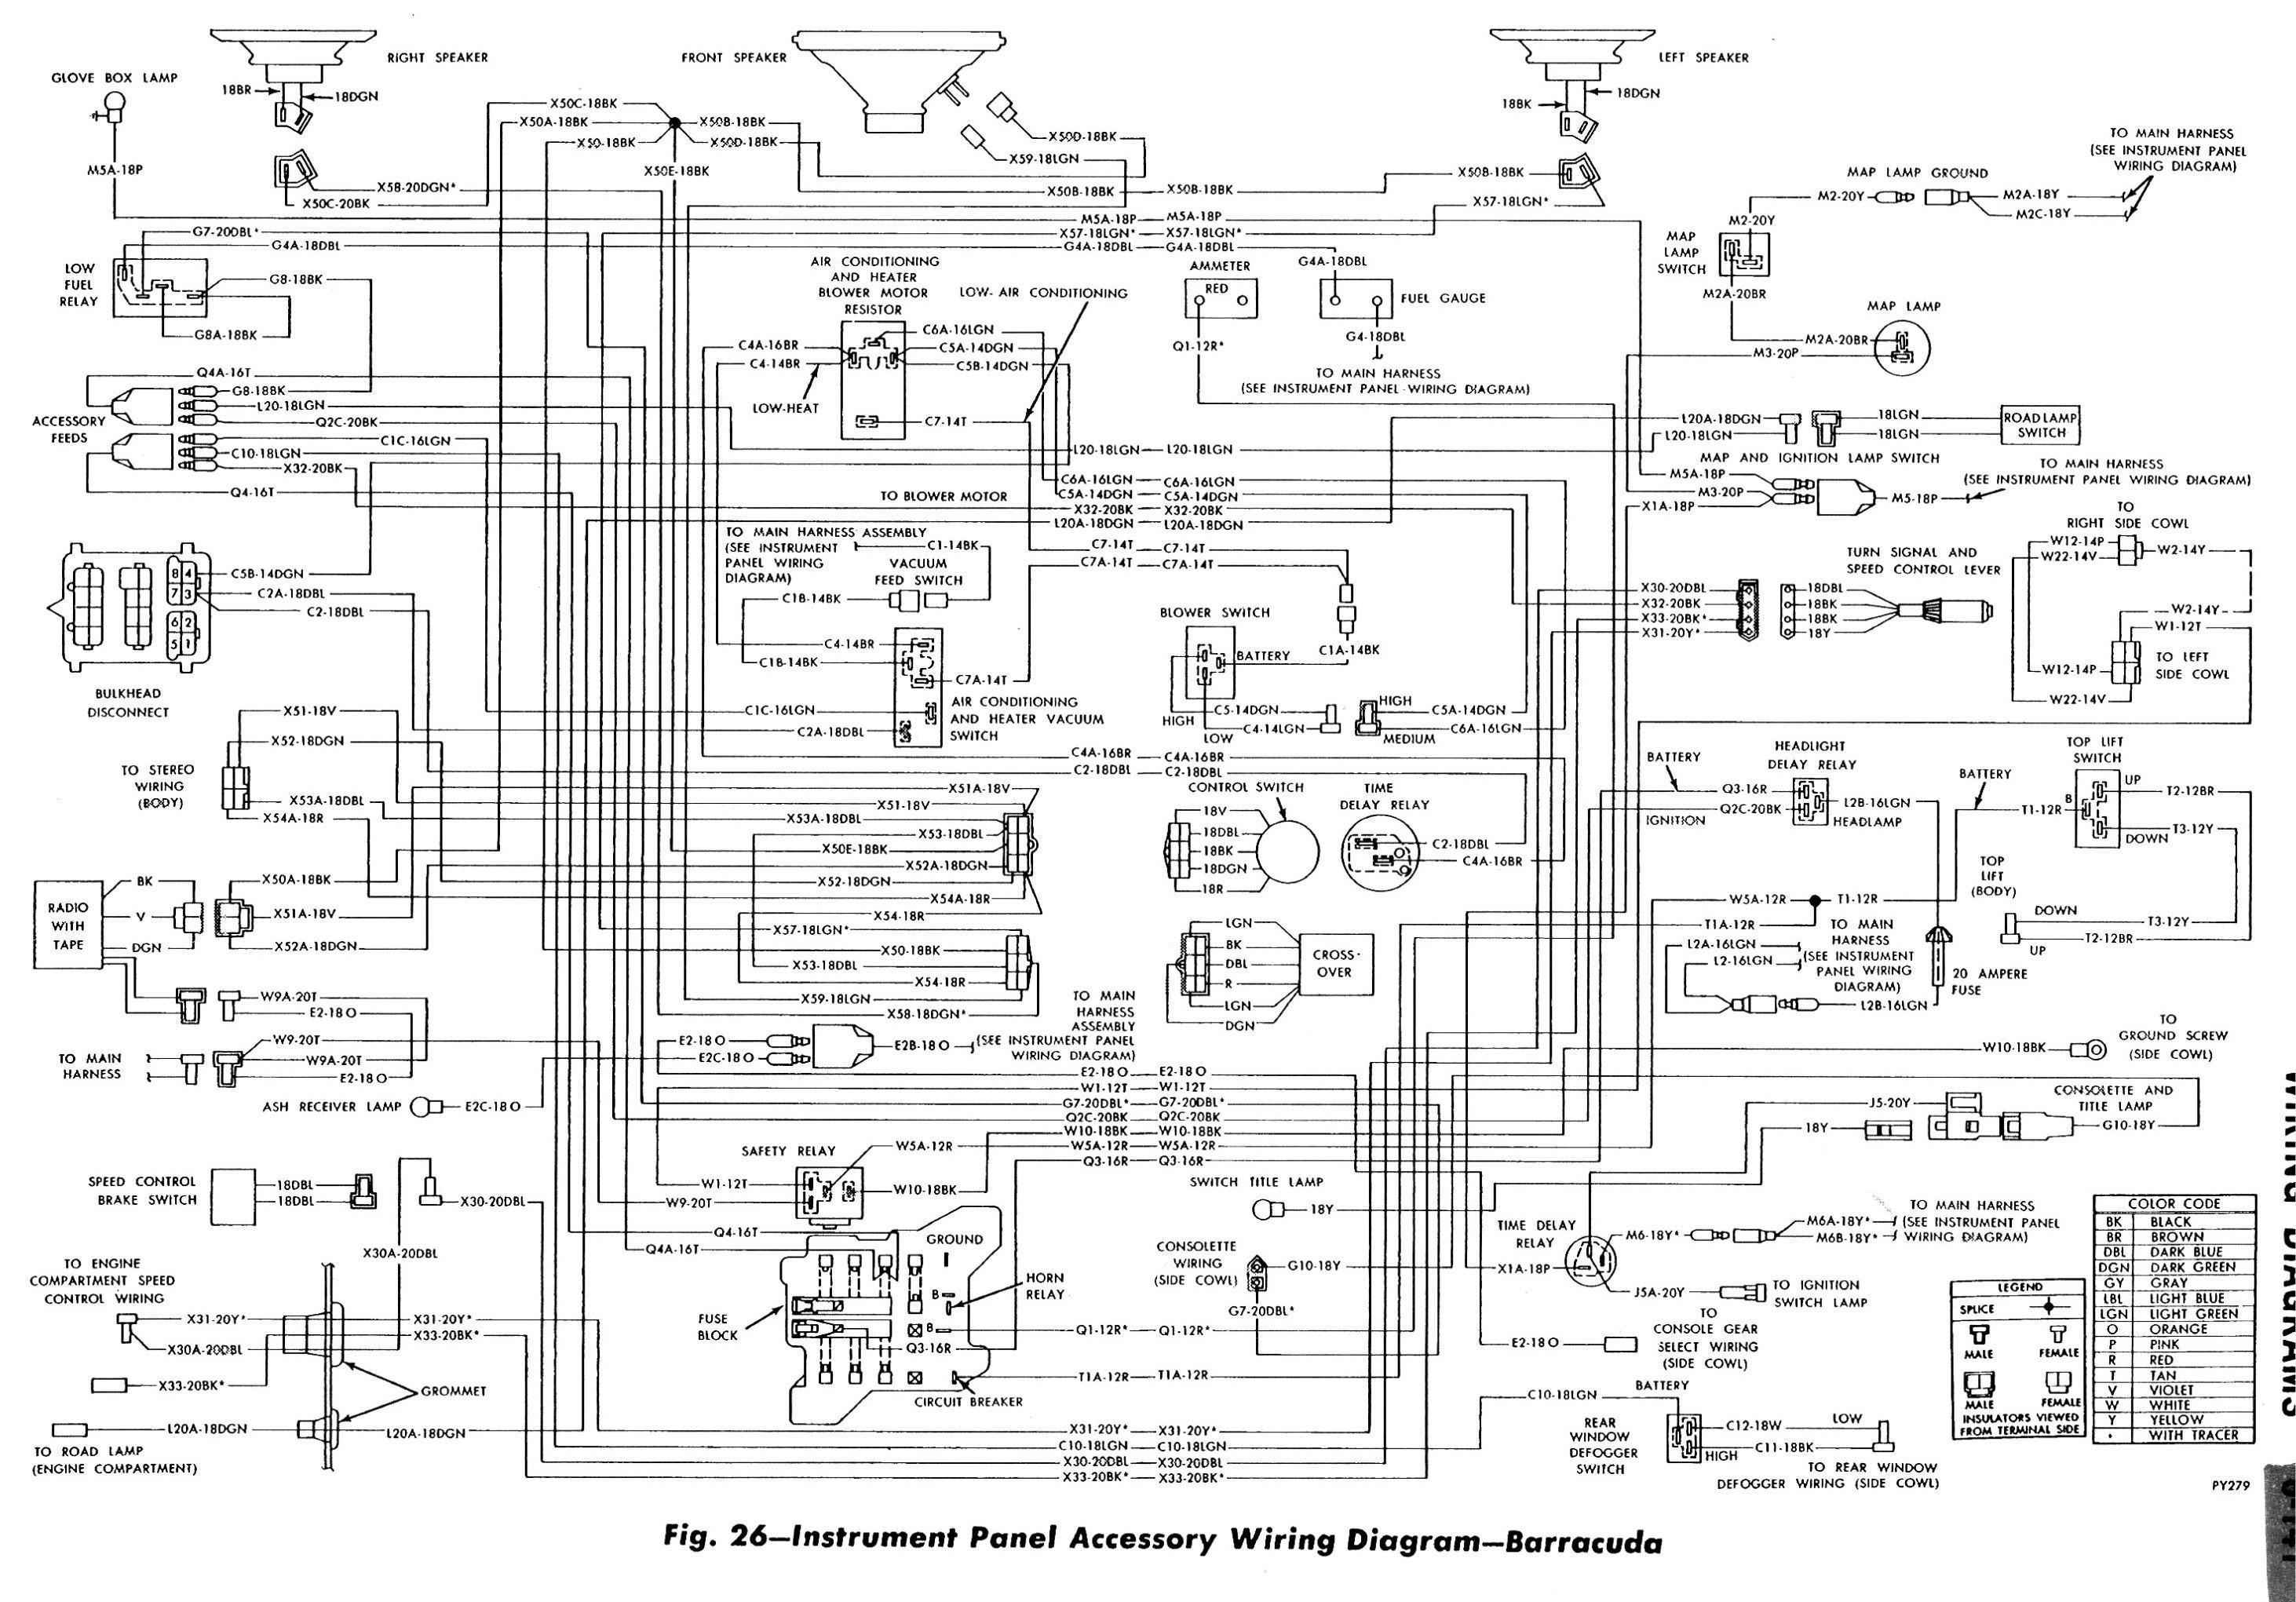 Surprising 1970 Plymouth Roadrunner Fuse Box Diagram Data Schema Wiring Cloud Orsalboapumohammedshrineorg